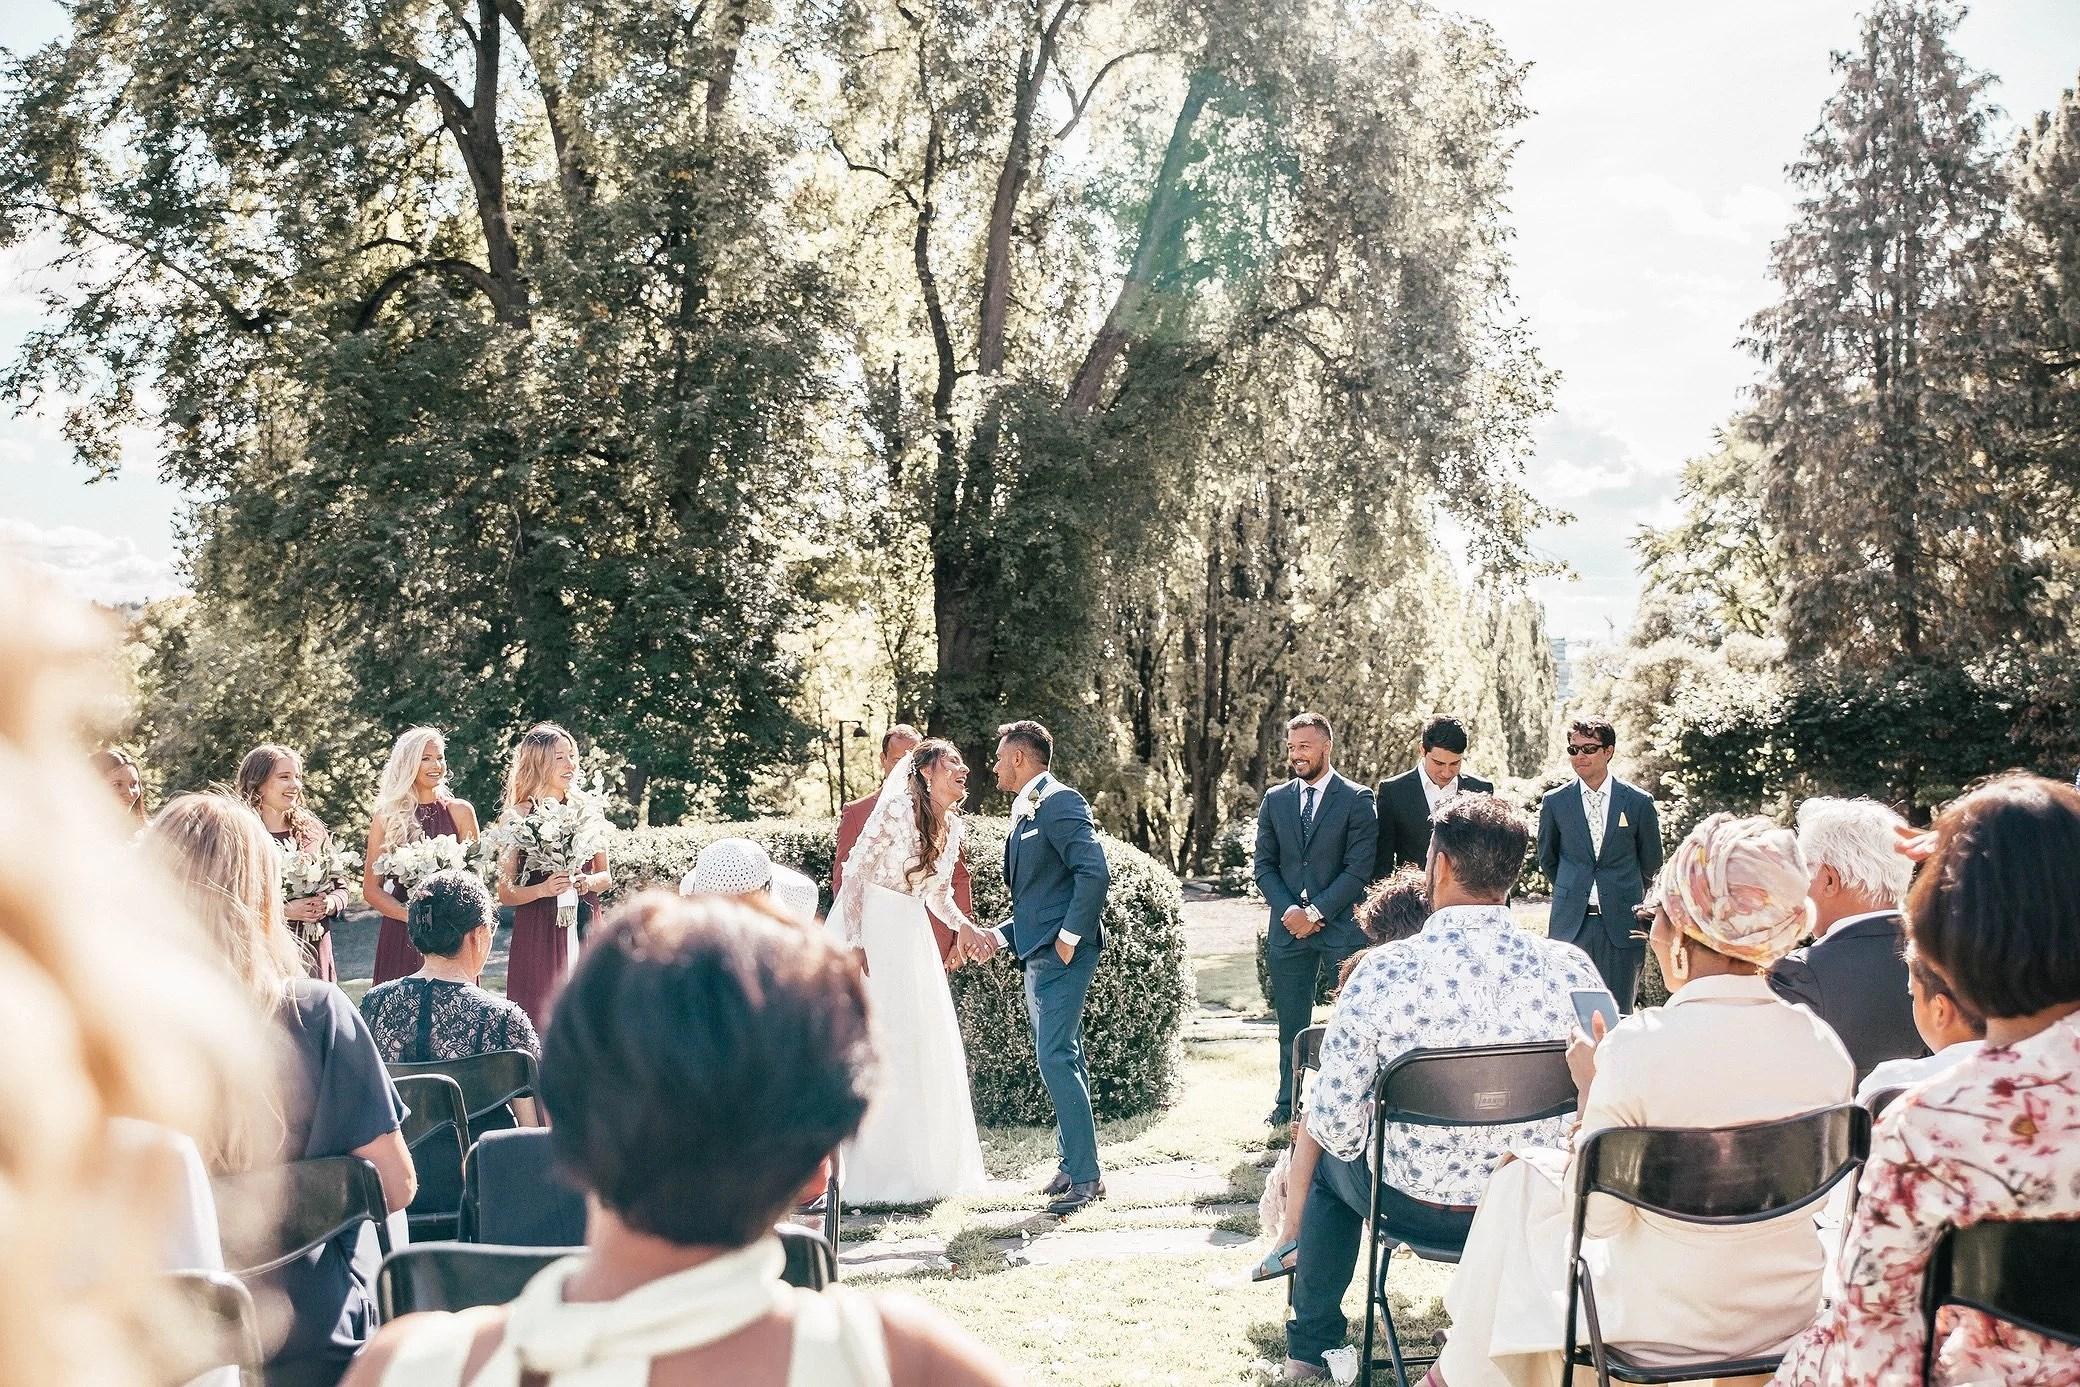 WEDDING WEEKEND PICTURE BOMB!